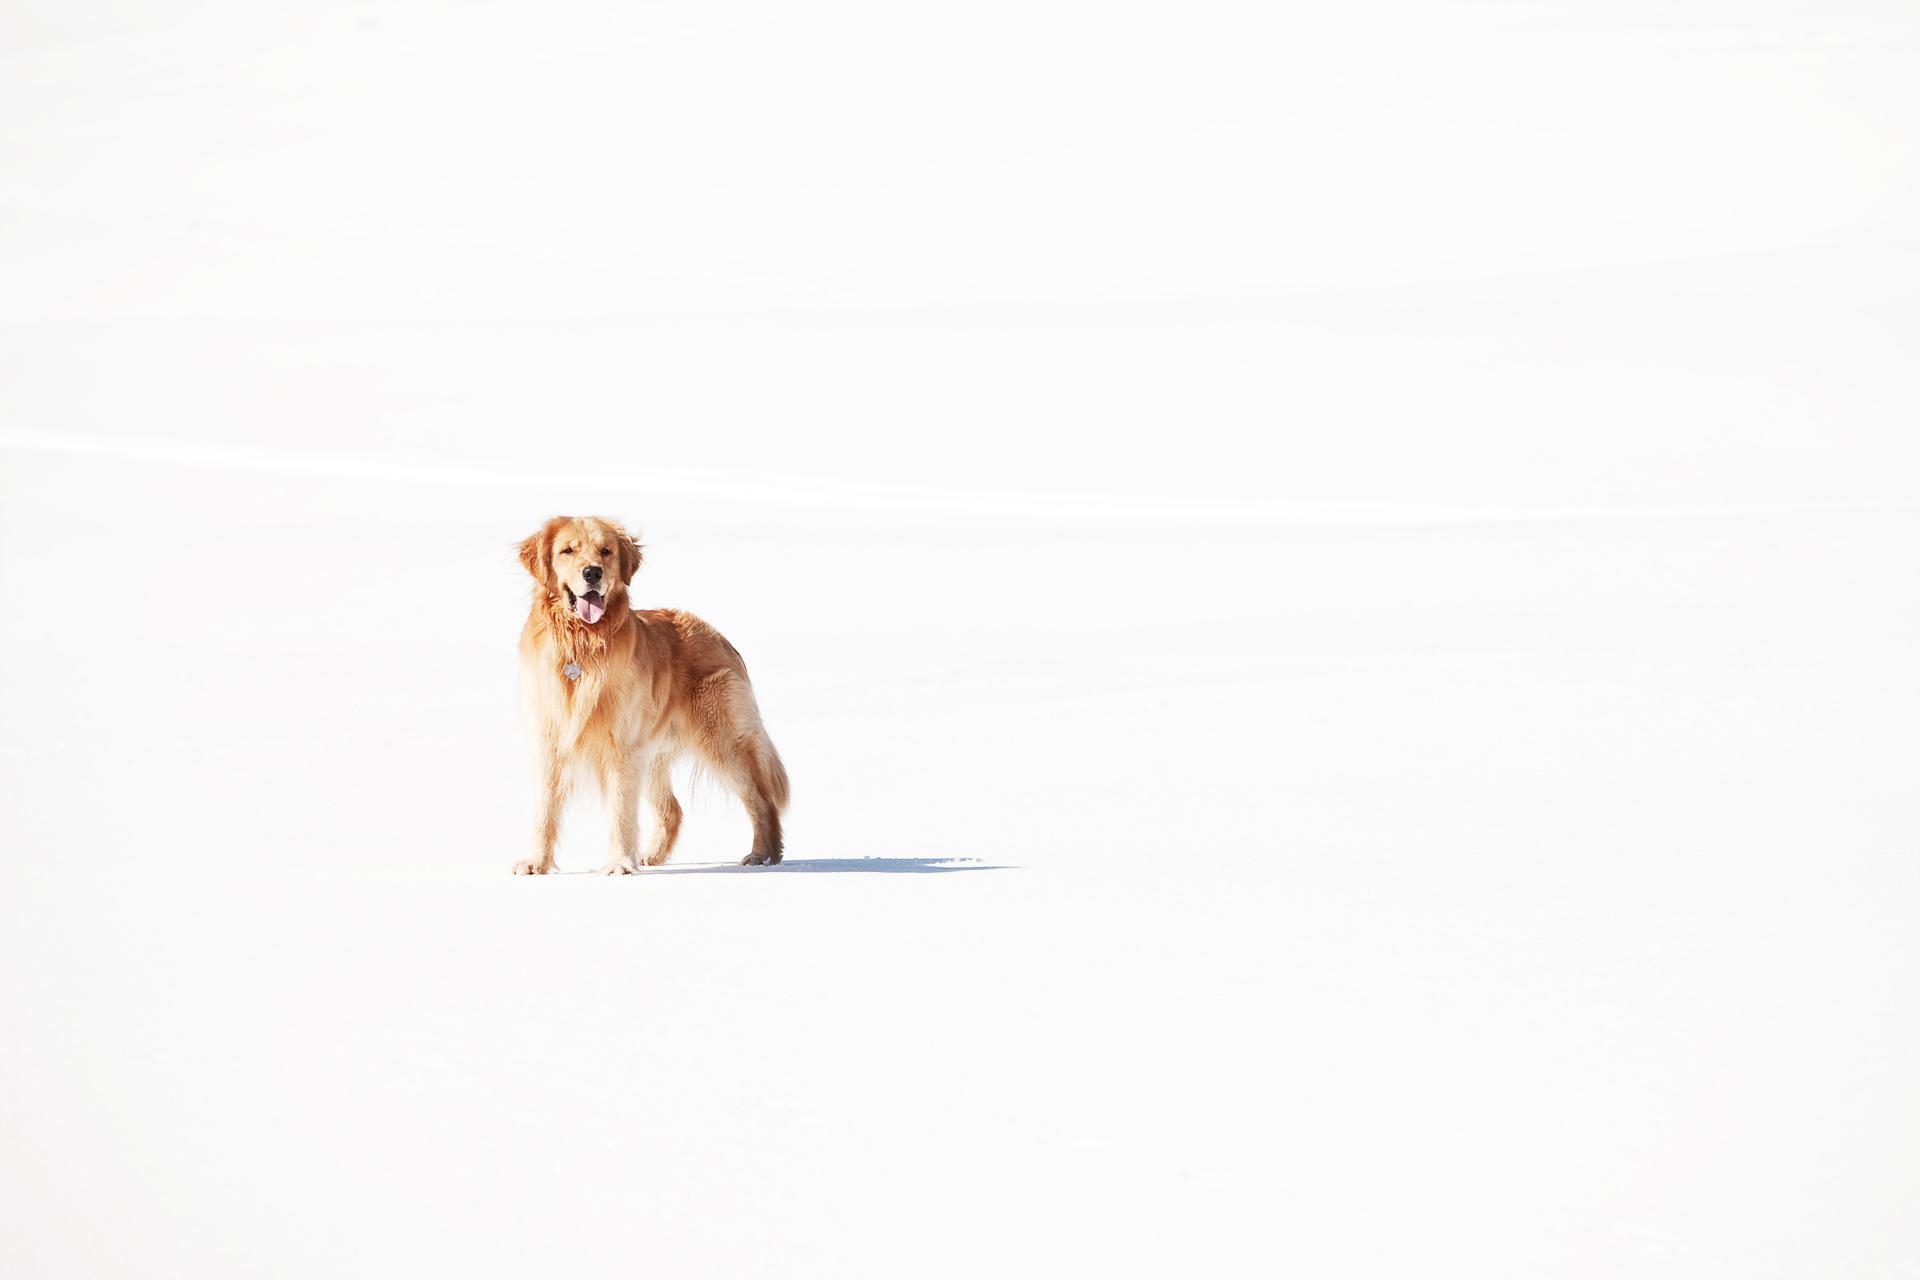 golden-retriever-snow-seattle